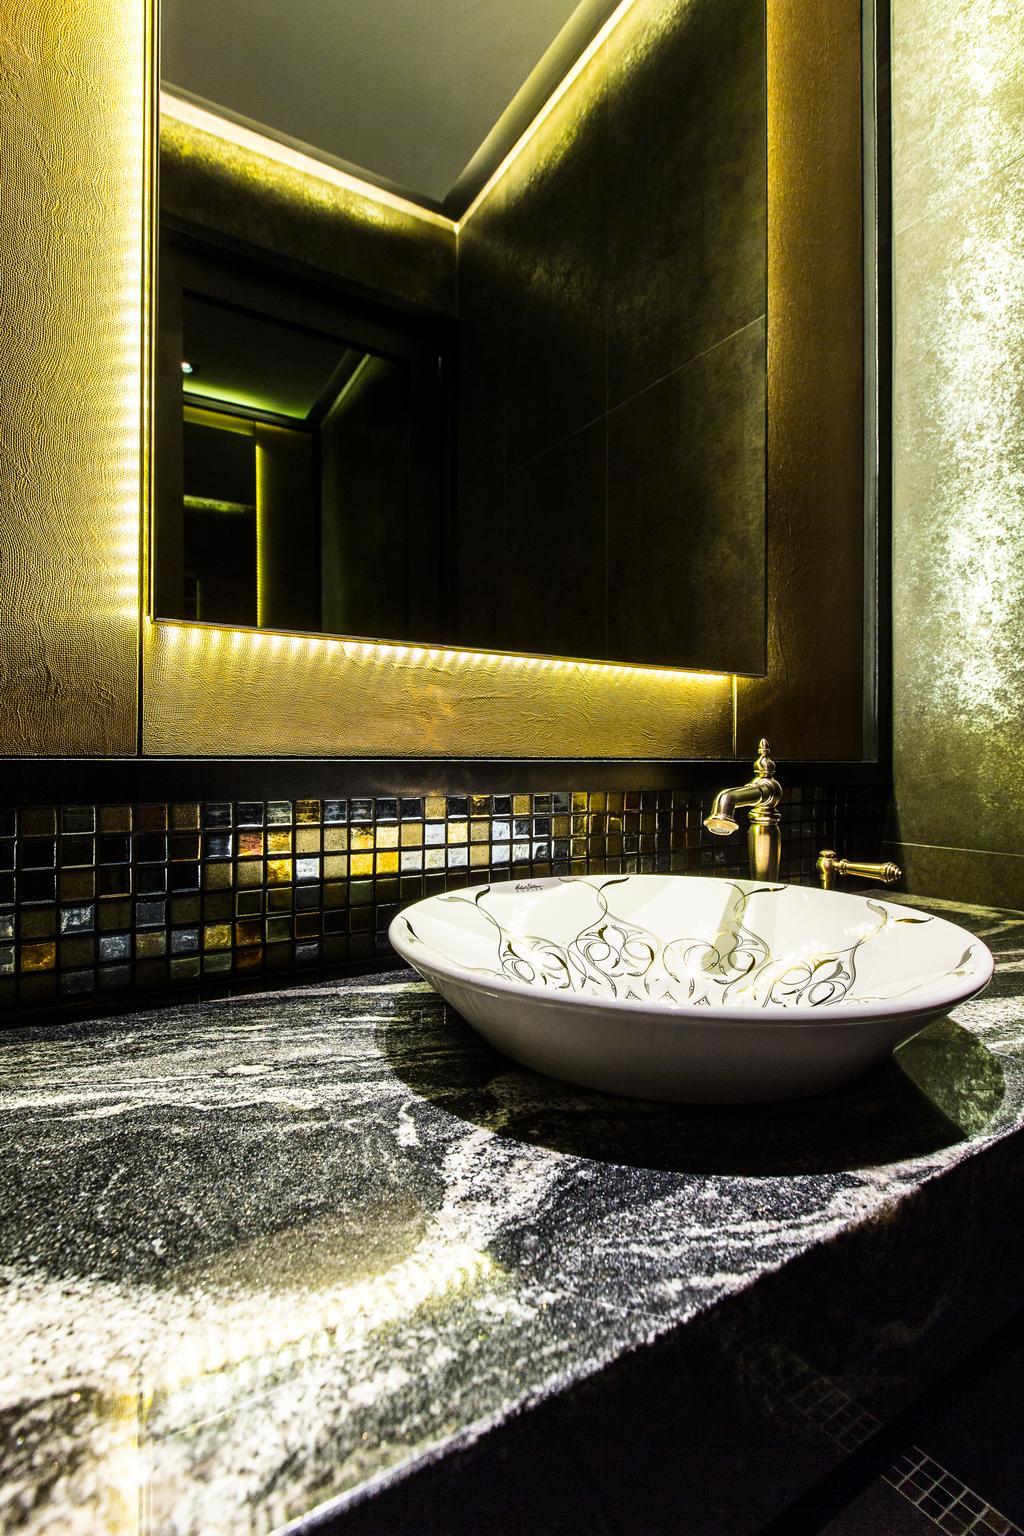 Summerhaus Office, Commercial, Interior Designer, Summerhaus D'zign, Contemporary, Bathroom, Bathtub, Tub